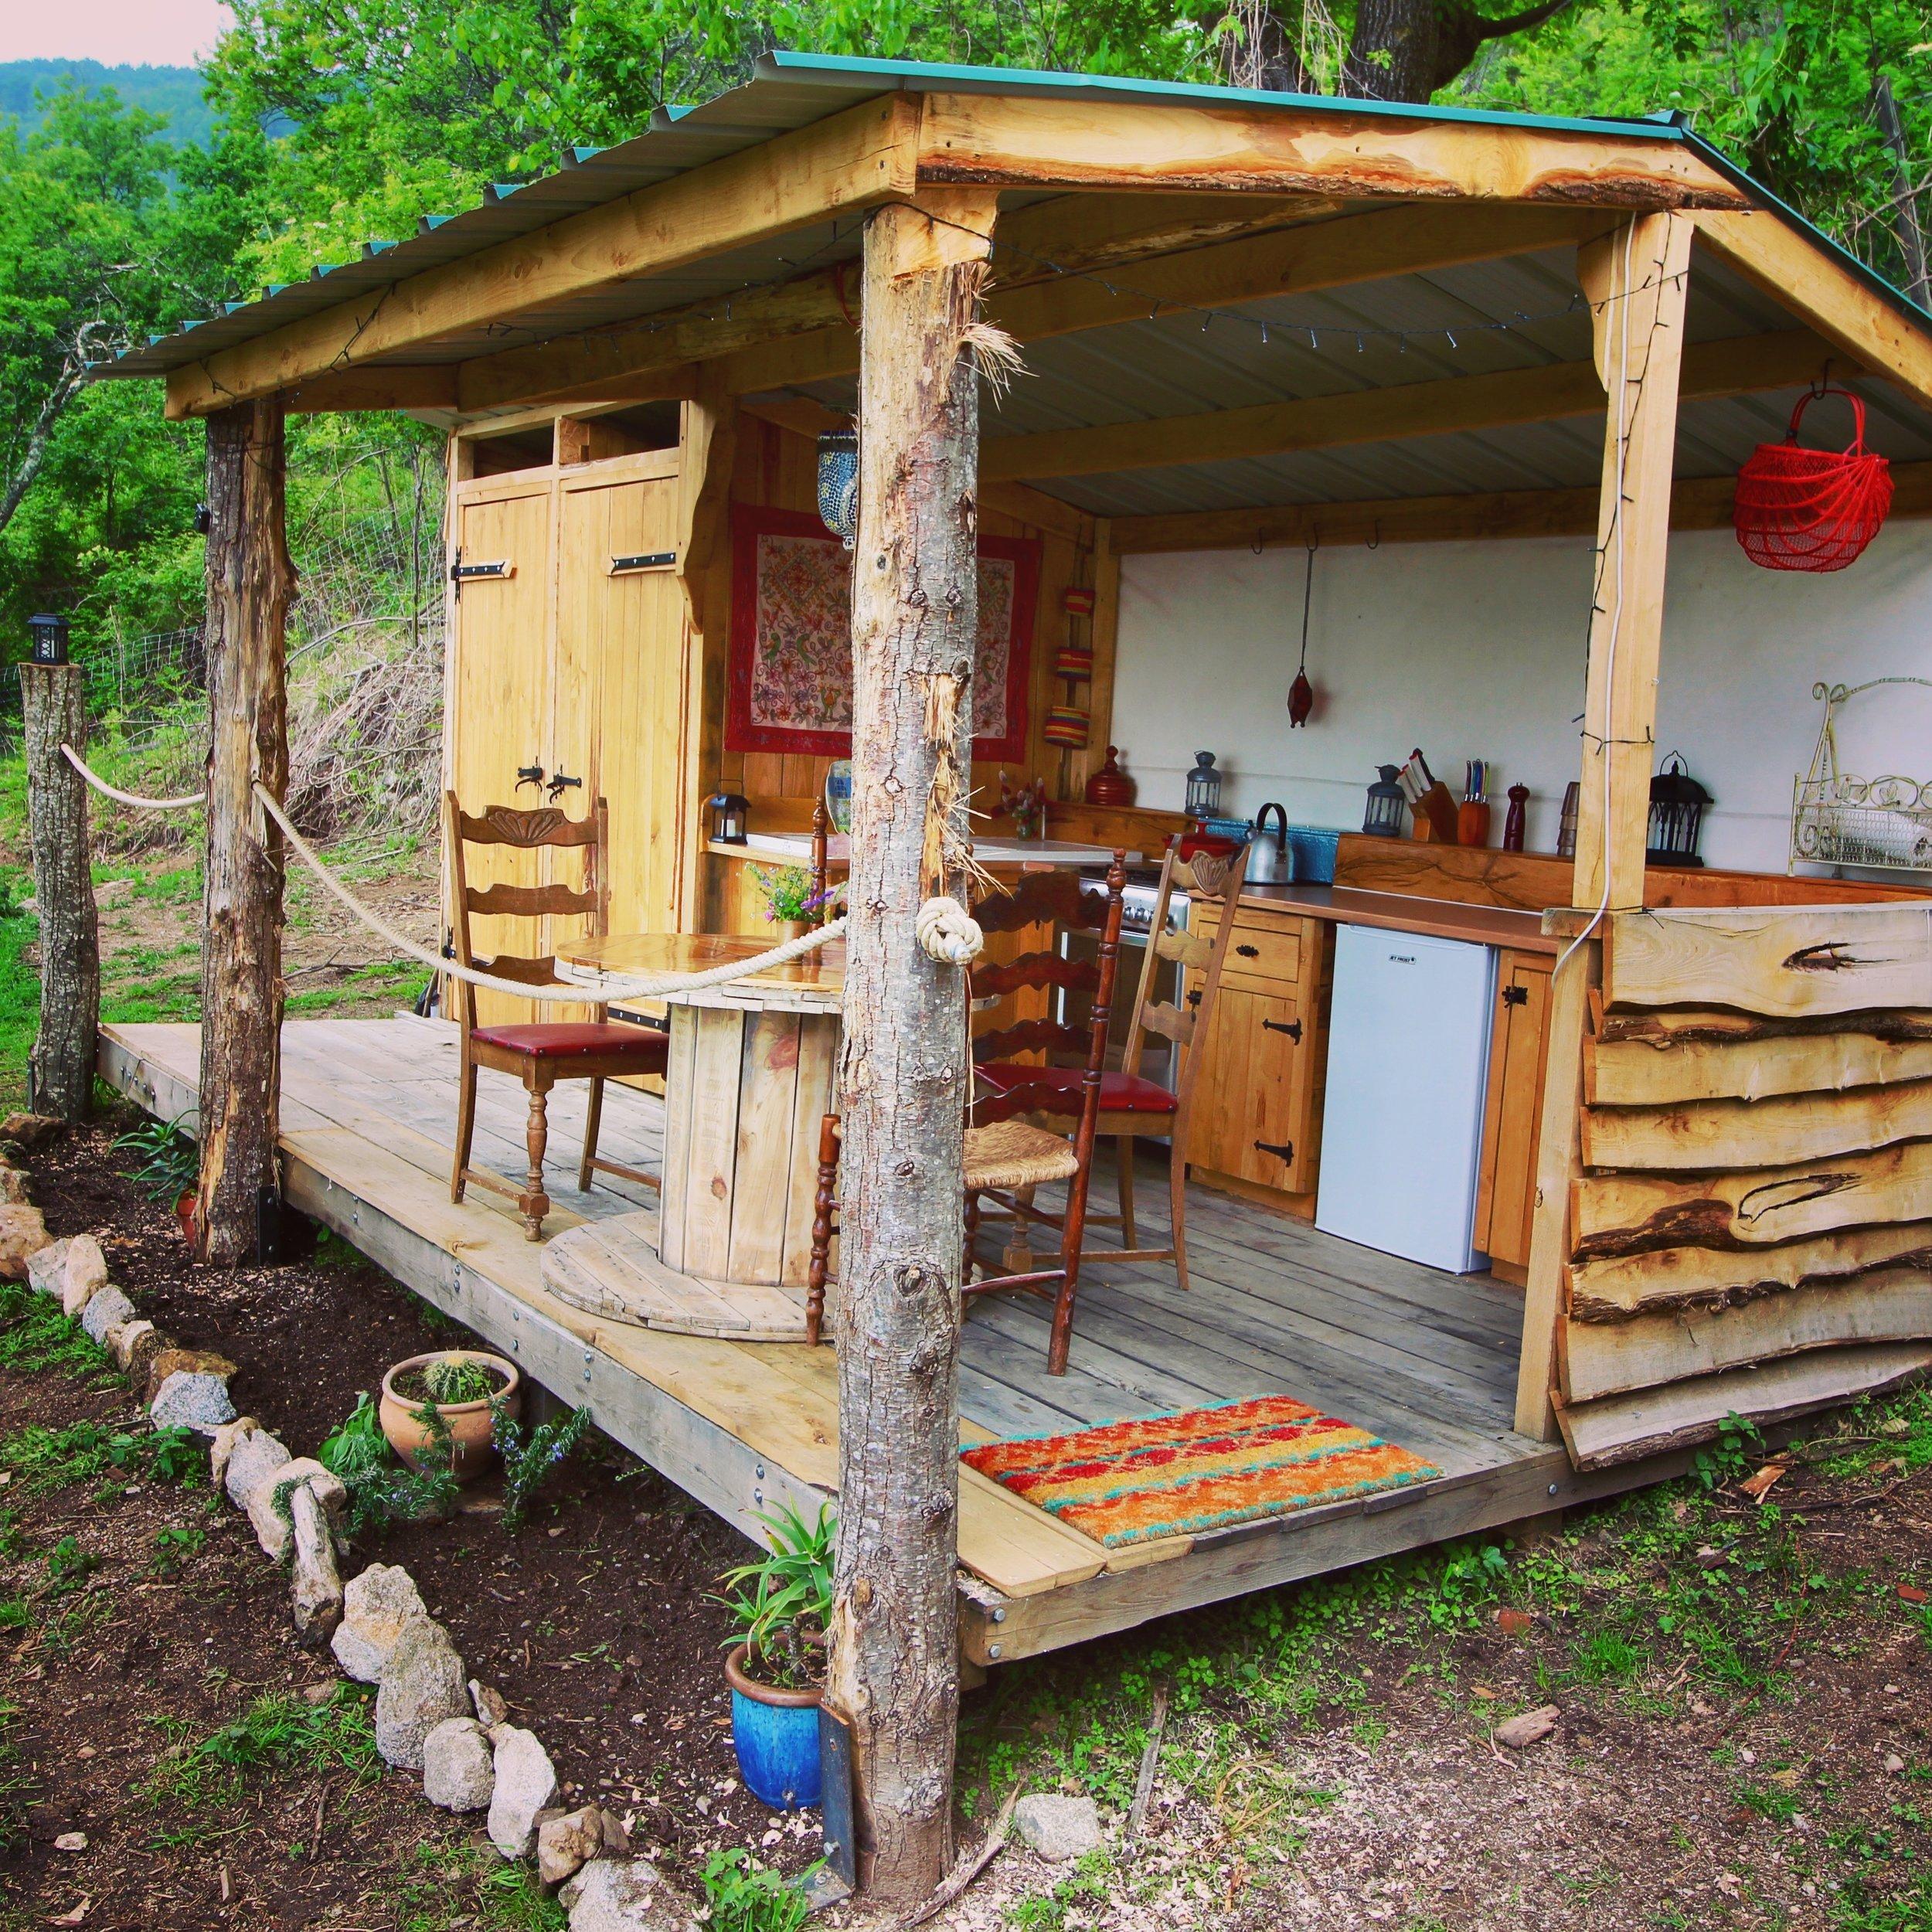 Summer kitchen of the yurt